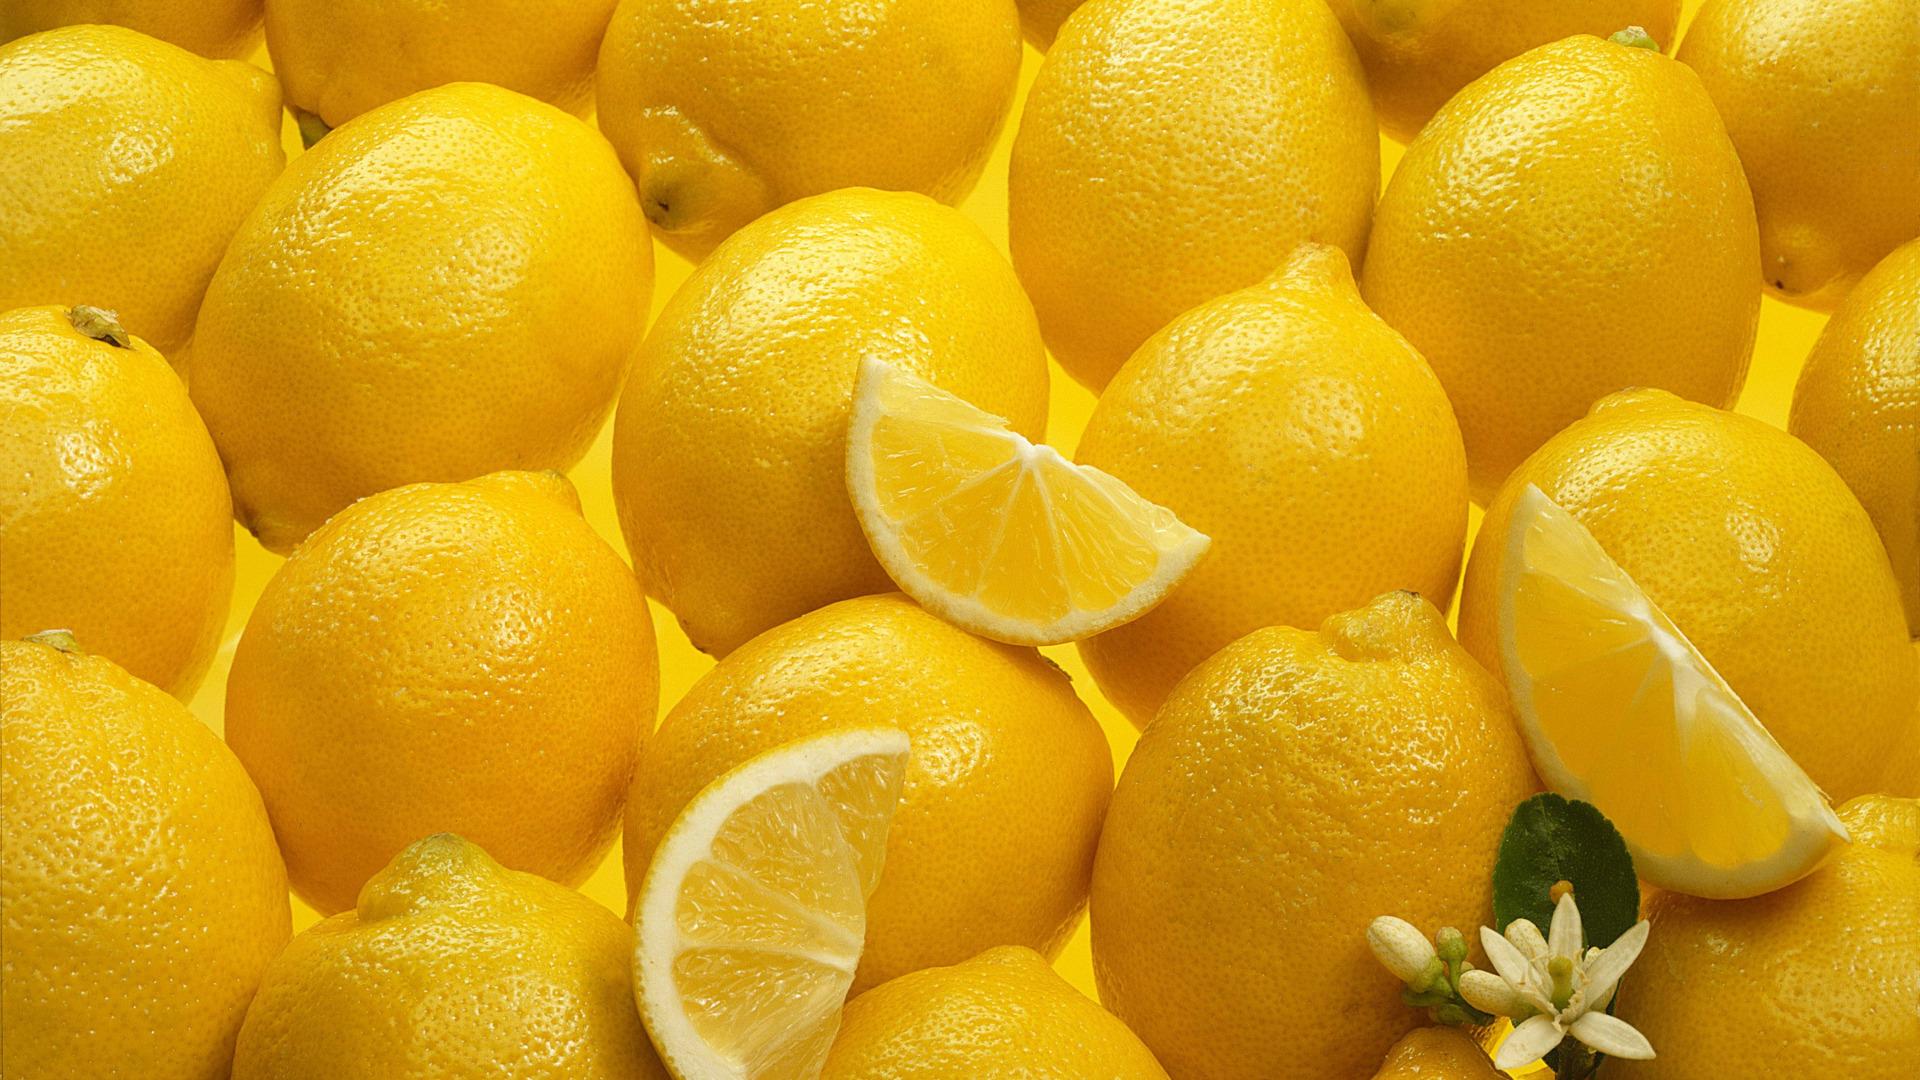 texture-lemons-yellow-tekstura-limon-tsvetok